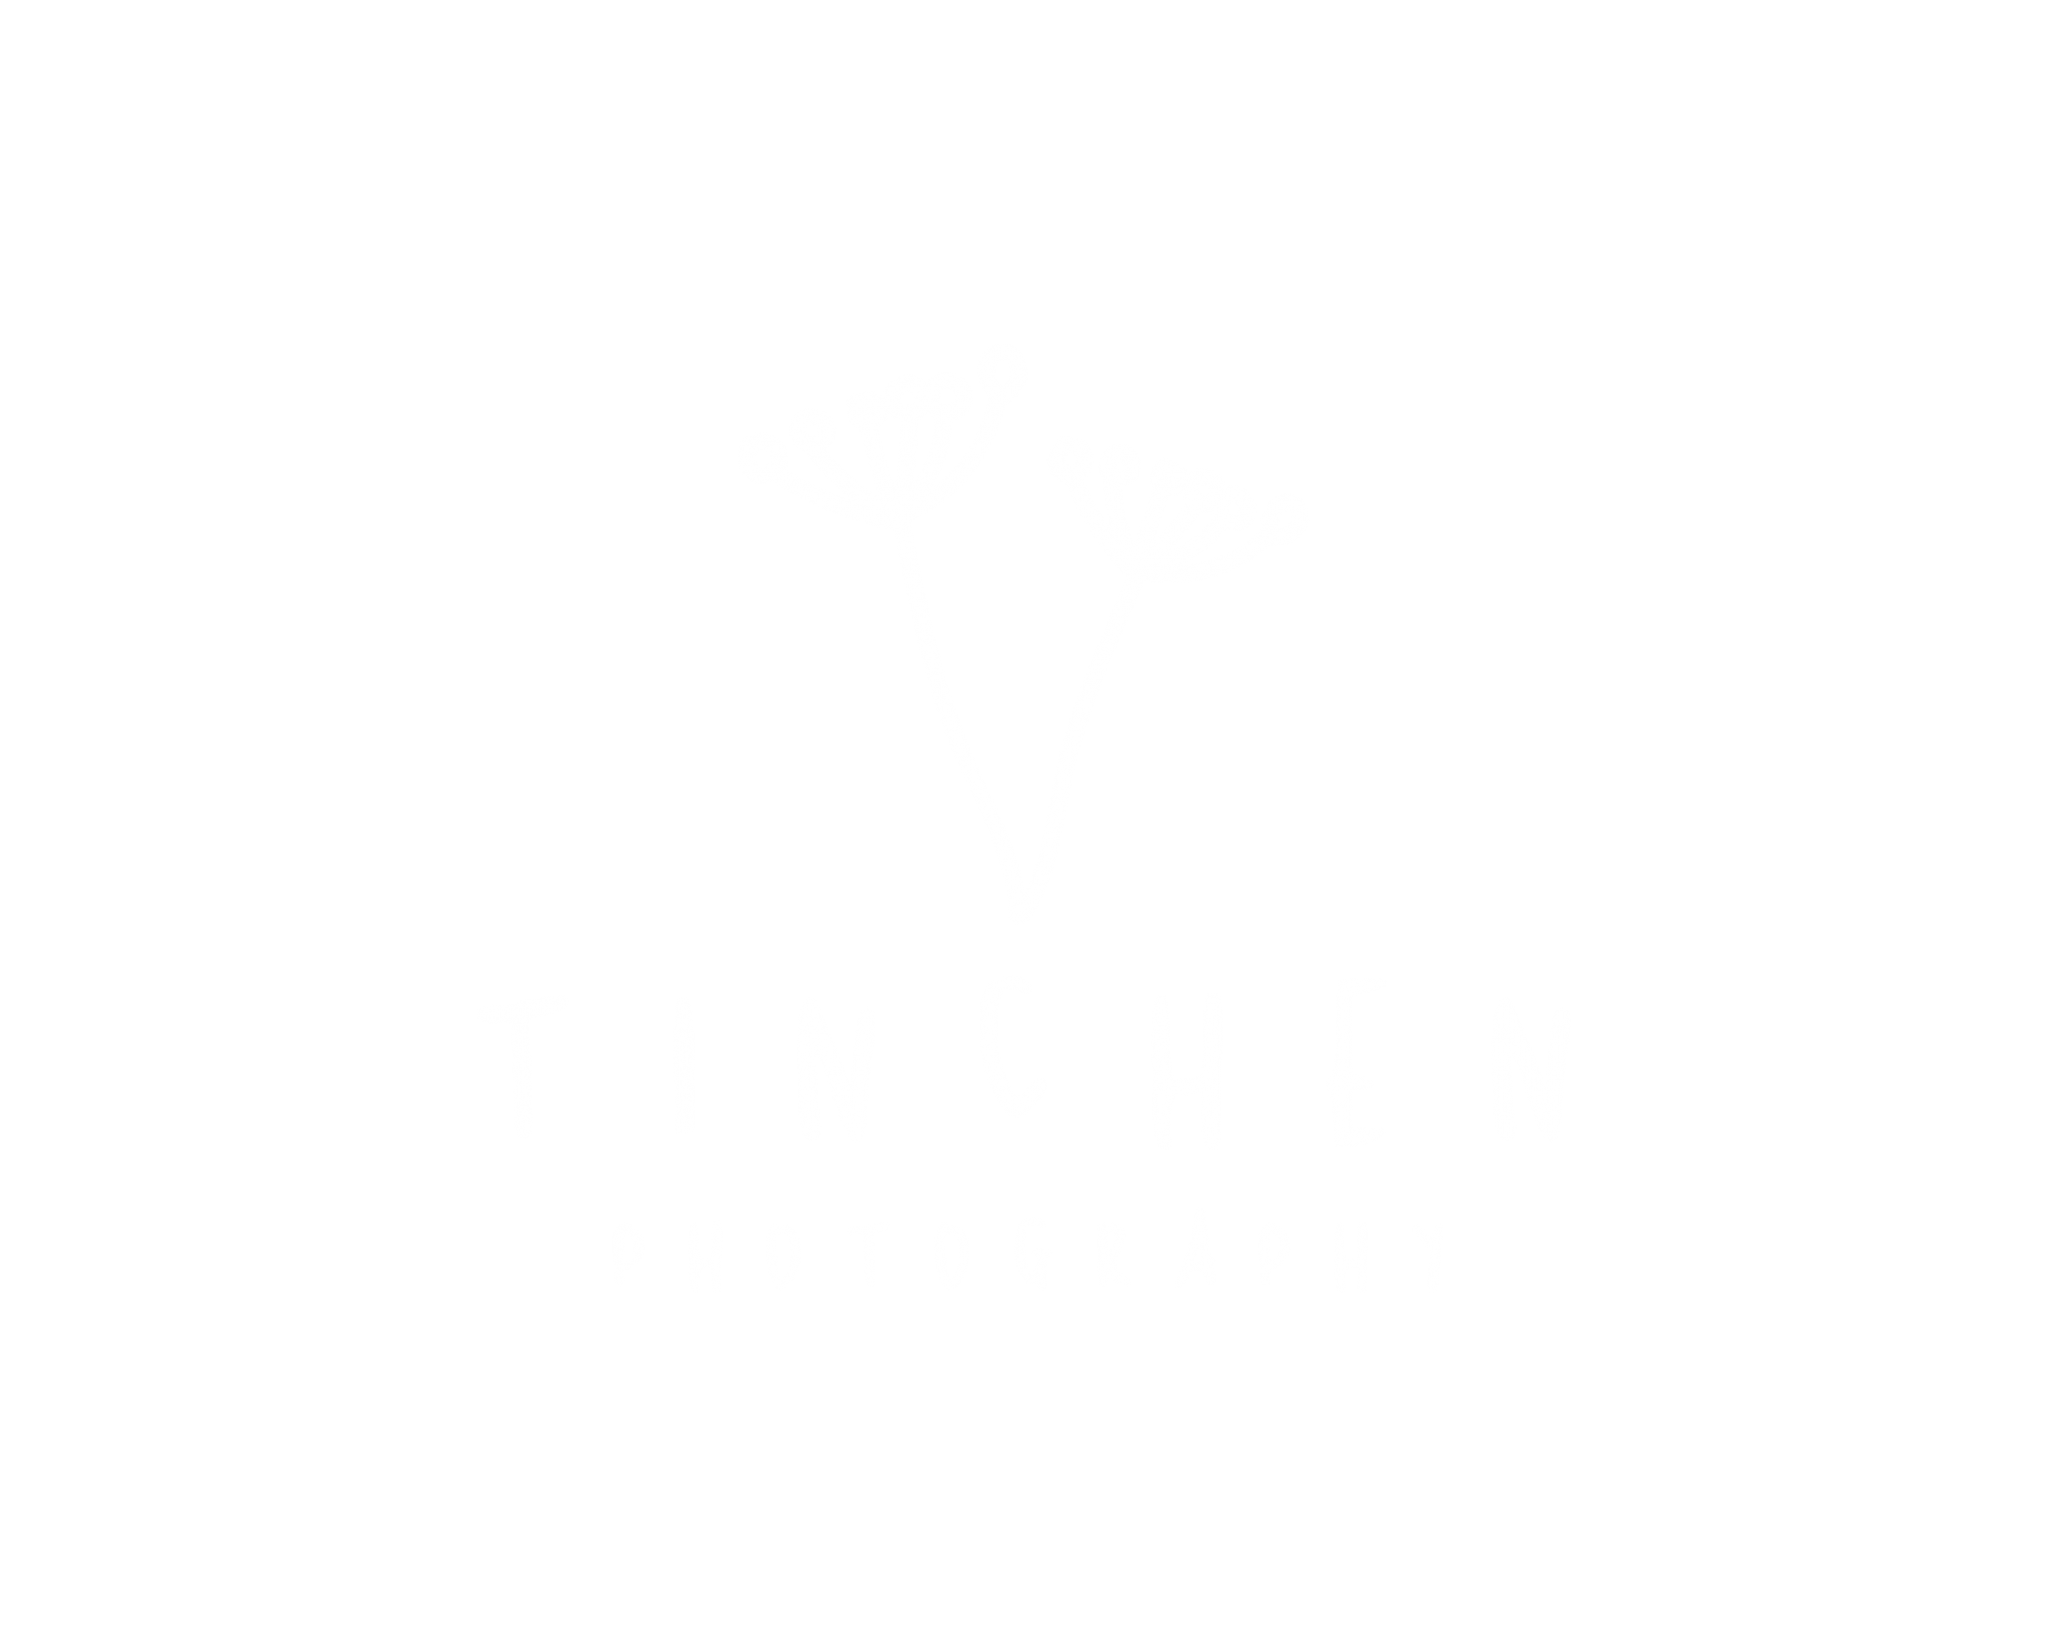 tinchen photography